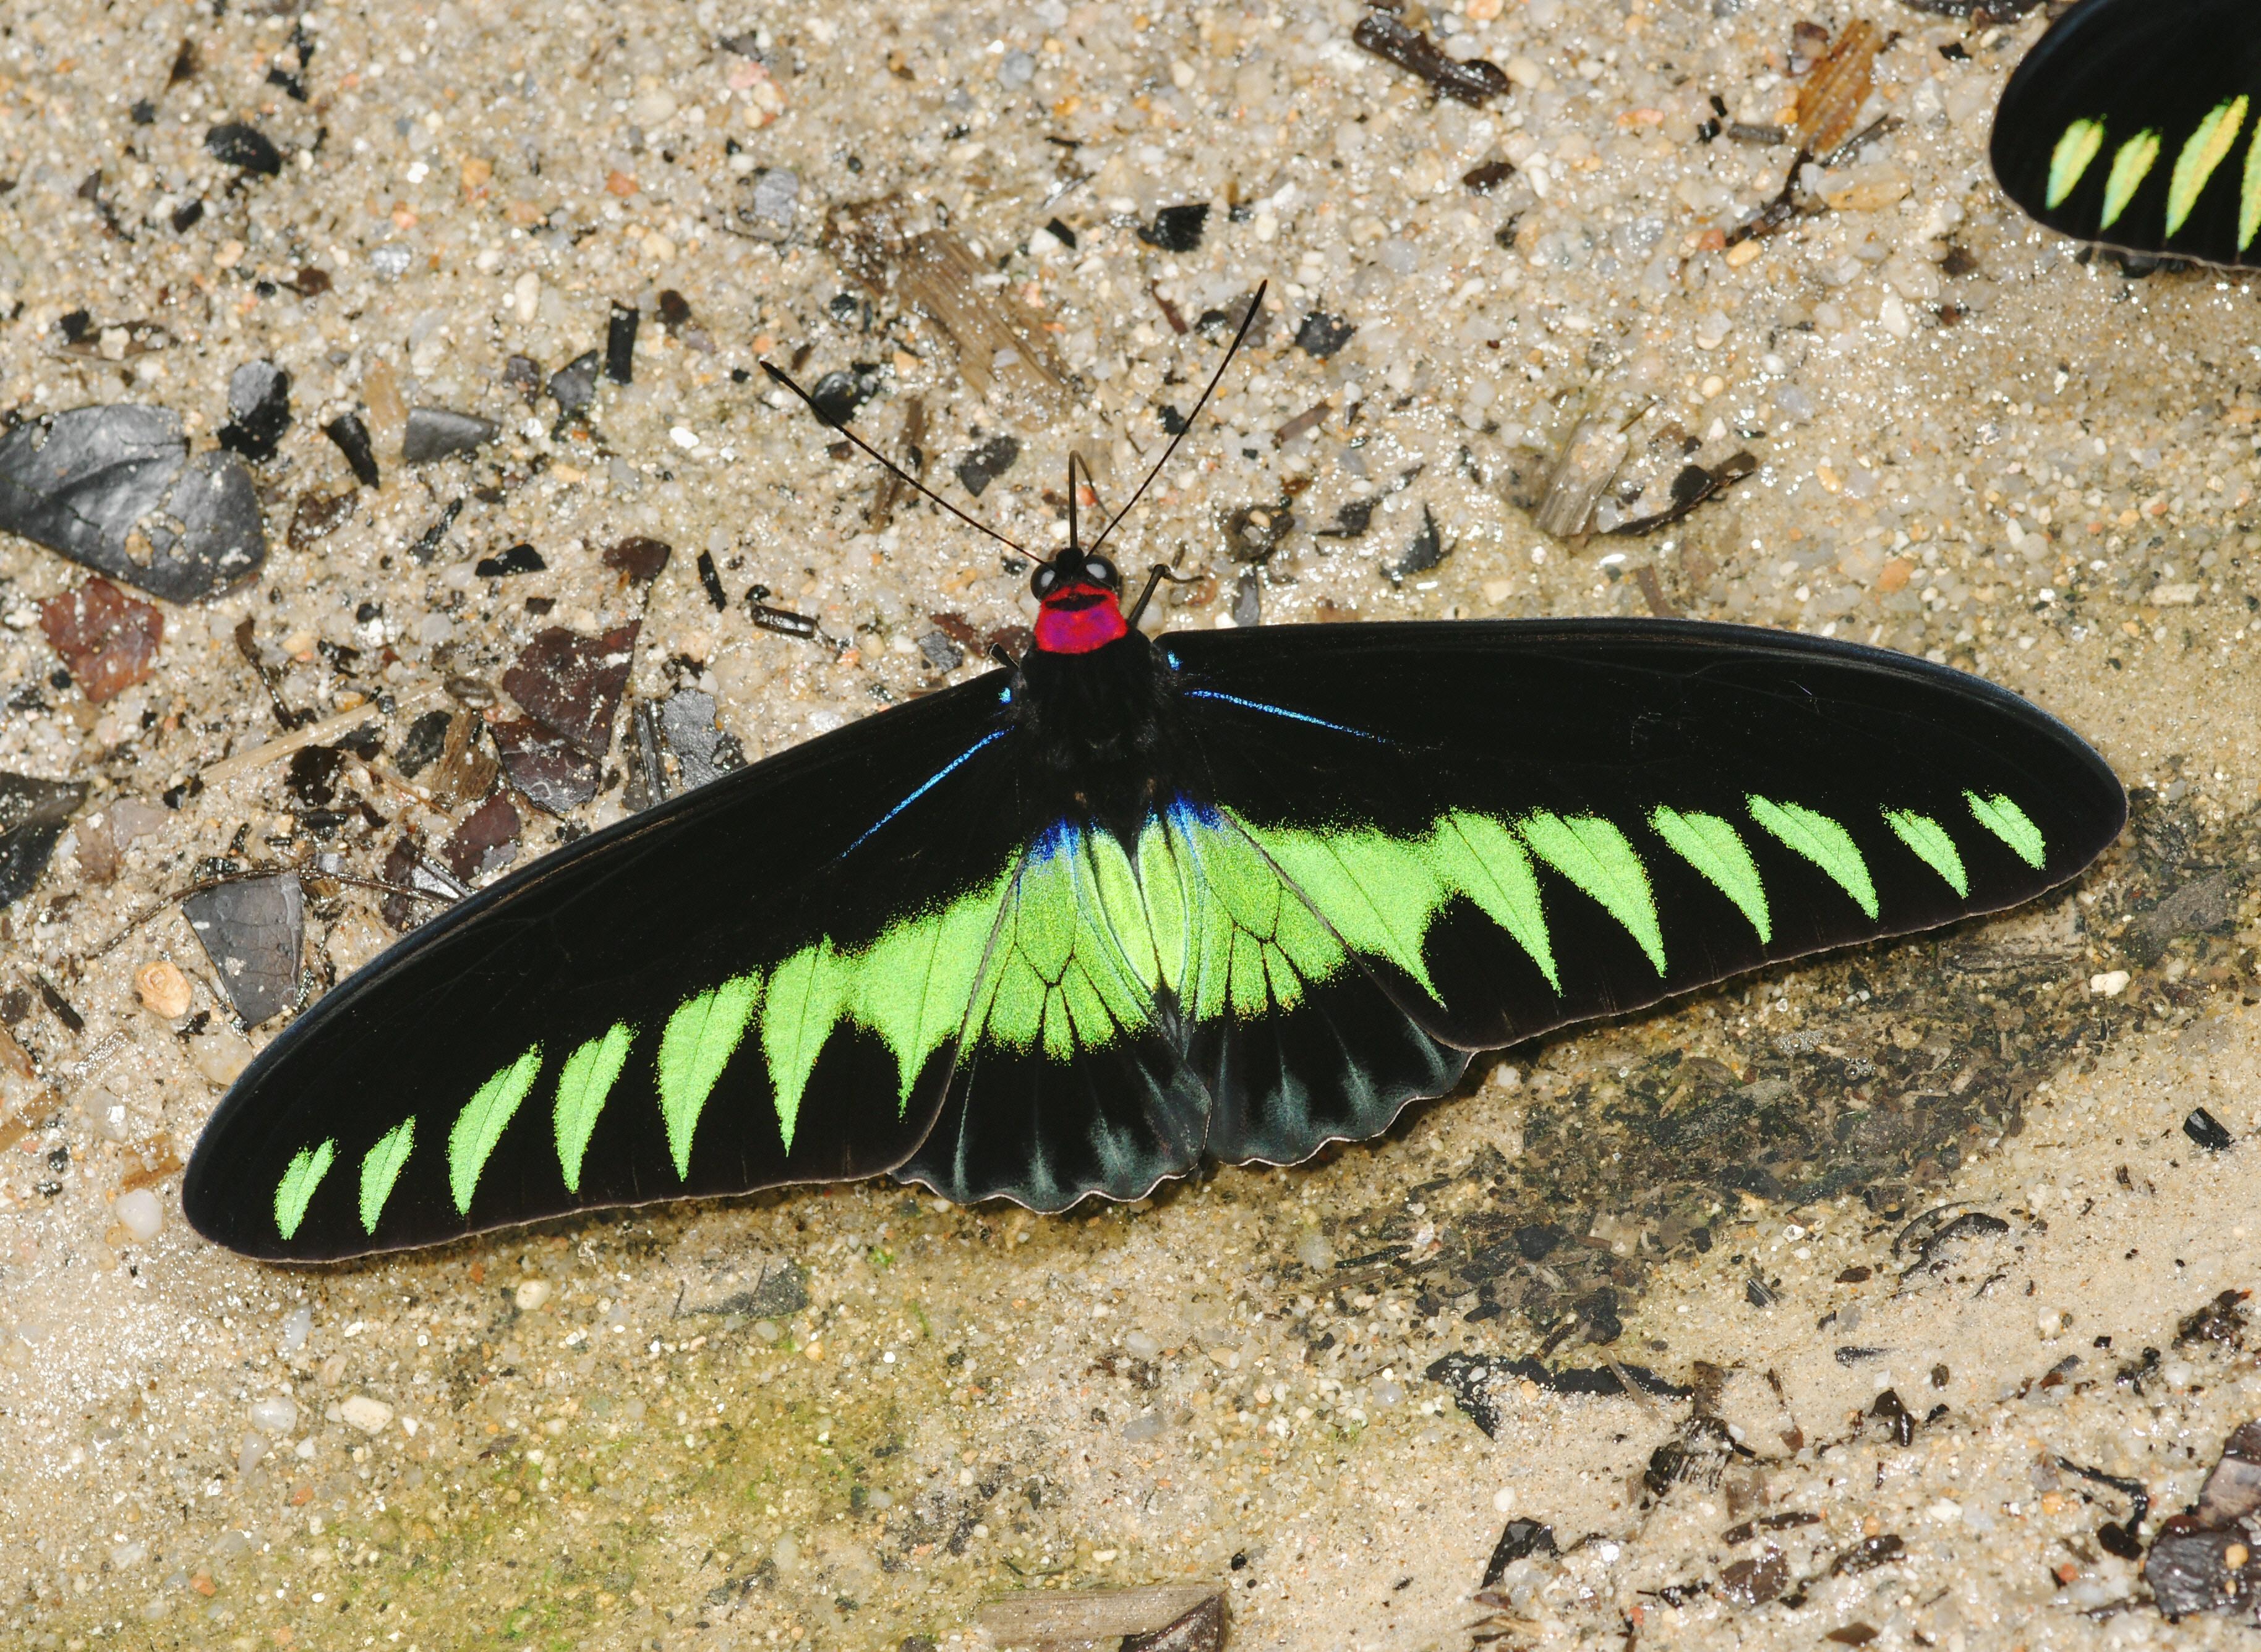 A Malaysian peninsula icon : Trogonoptera brookiana (here a male) (Source : A. Hoskins)